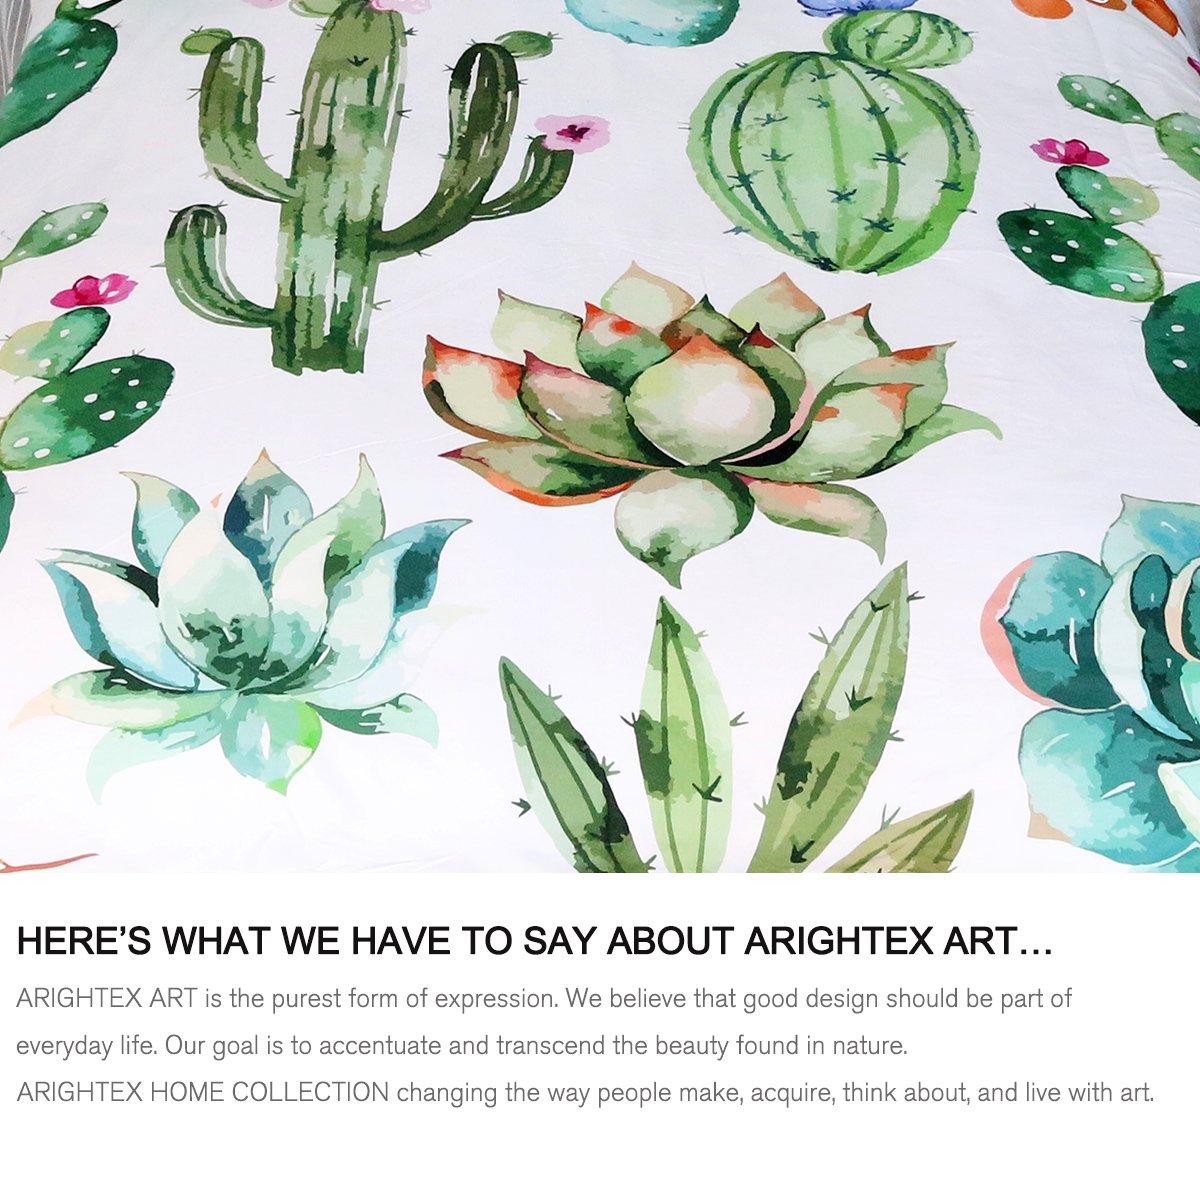 Twin Kingtex ARIGHTEX Cactus Bedding Summer Plant Succulent Bedspread 2 Piece Kids Girls Dorm Green Natural Duvet Cover